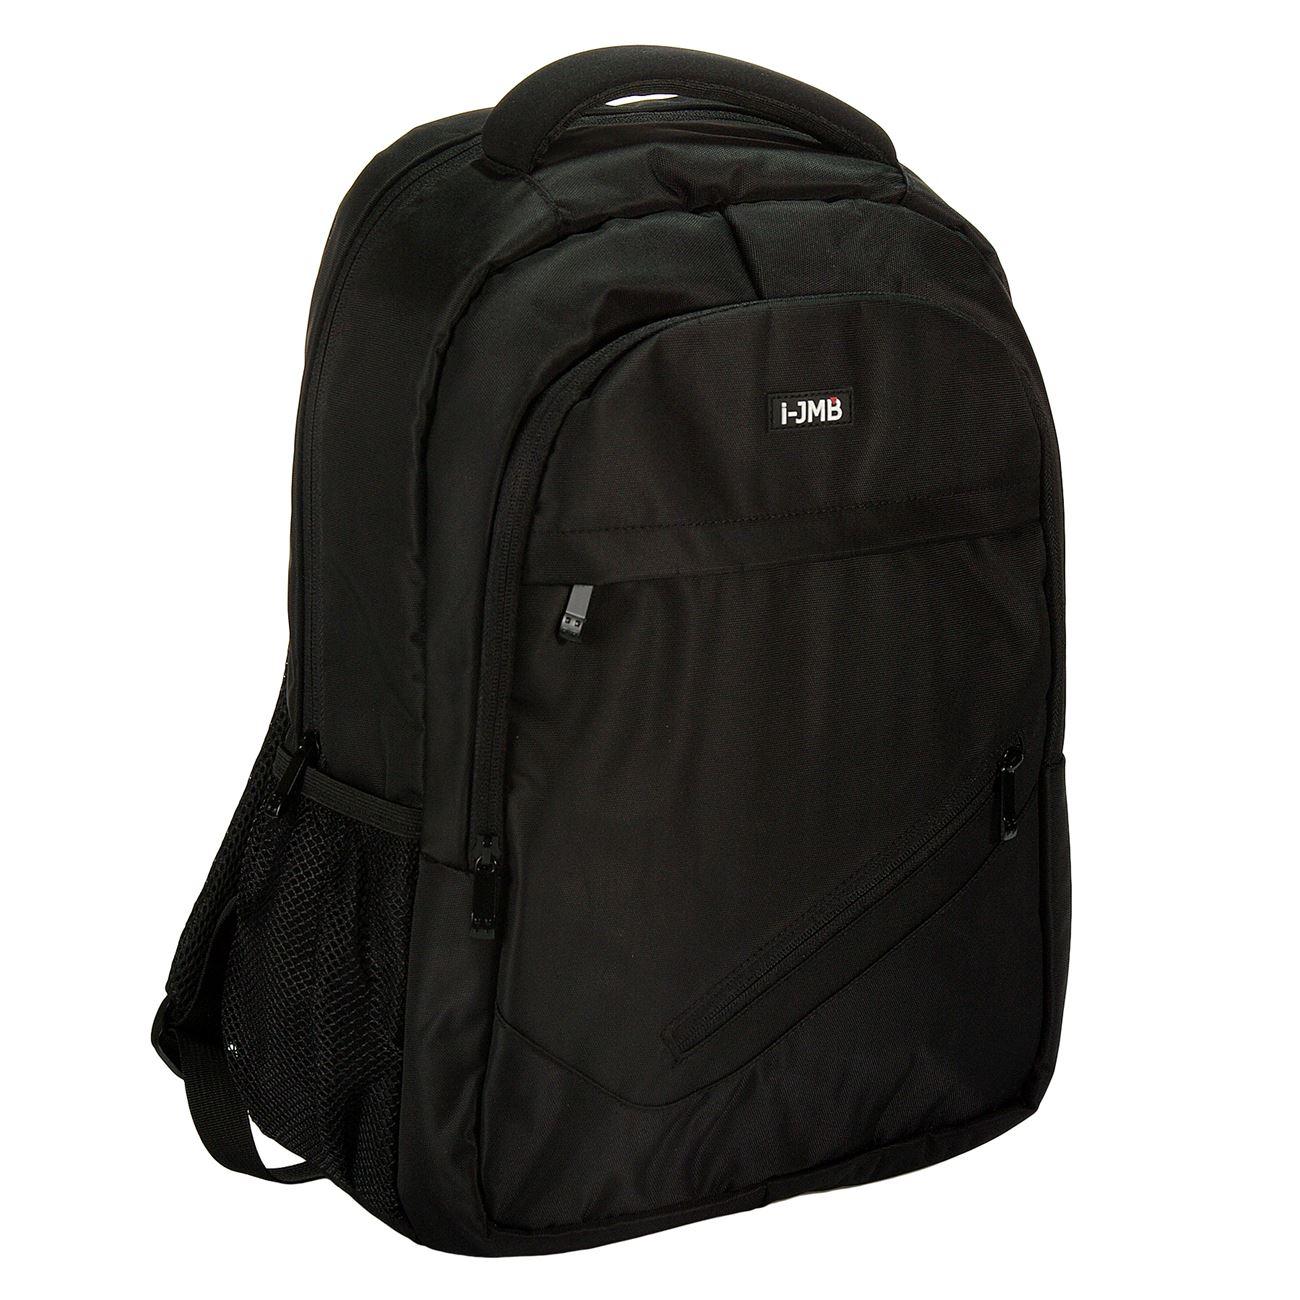 389ee1fbcf8 Σακίδιο Laptop Μαύρο < Τσάντες Laptop Πλάτης | Jumbo